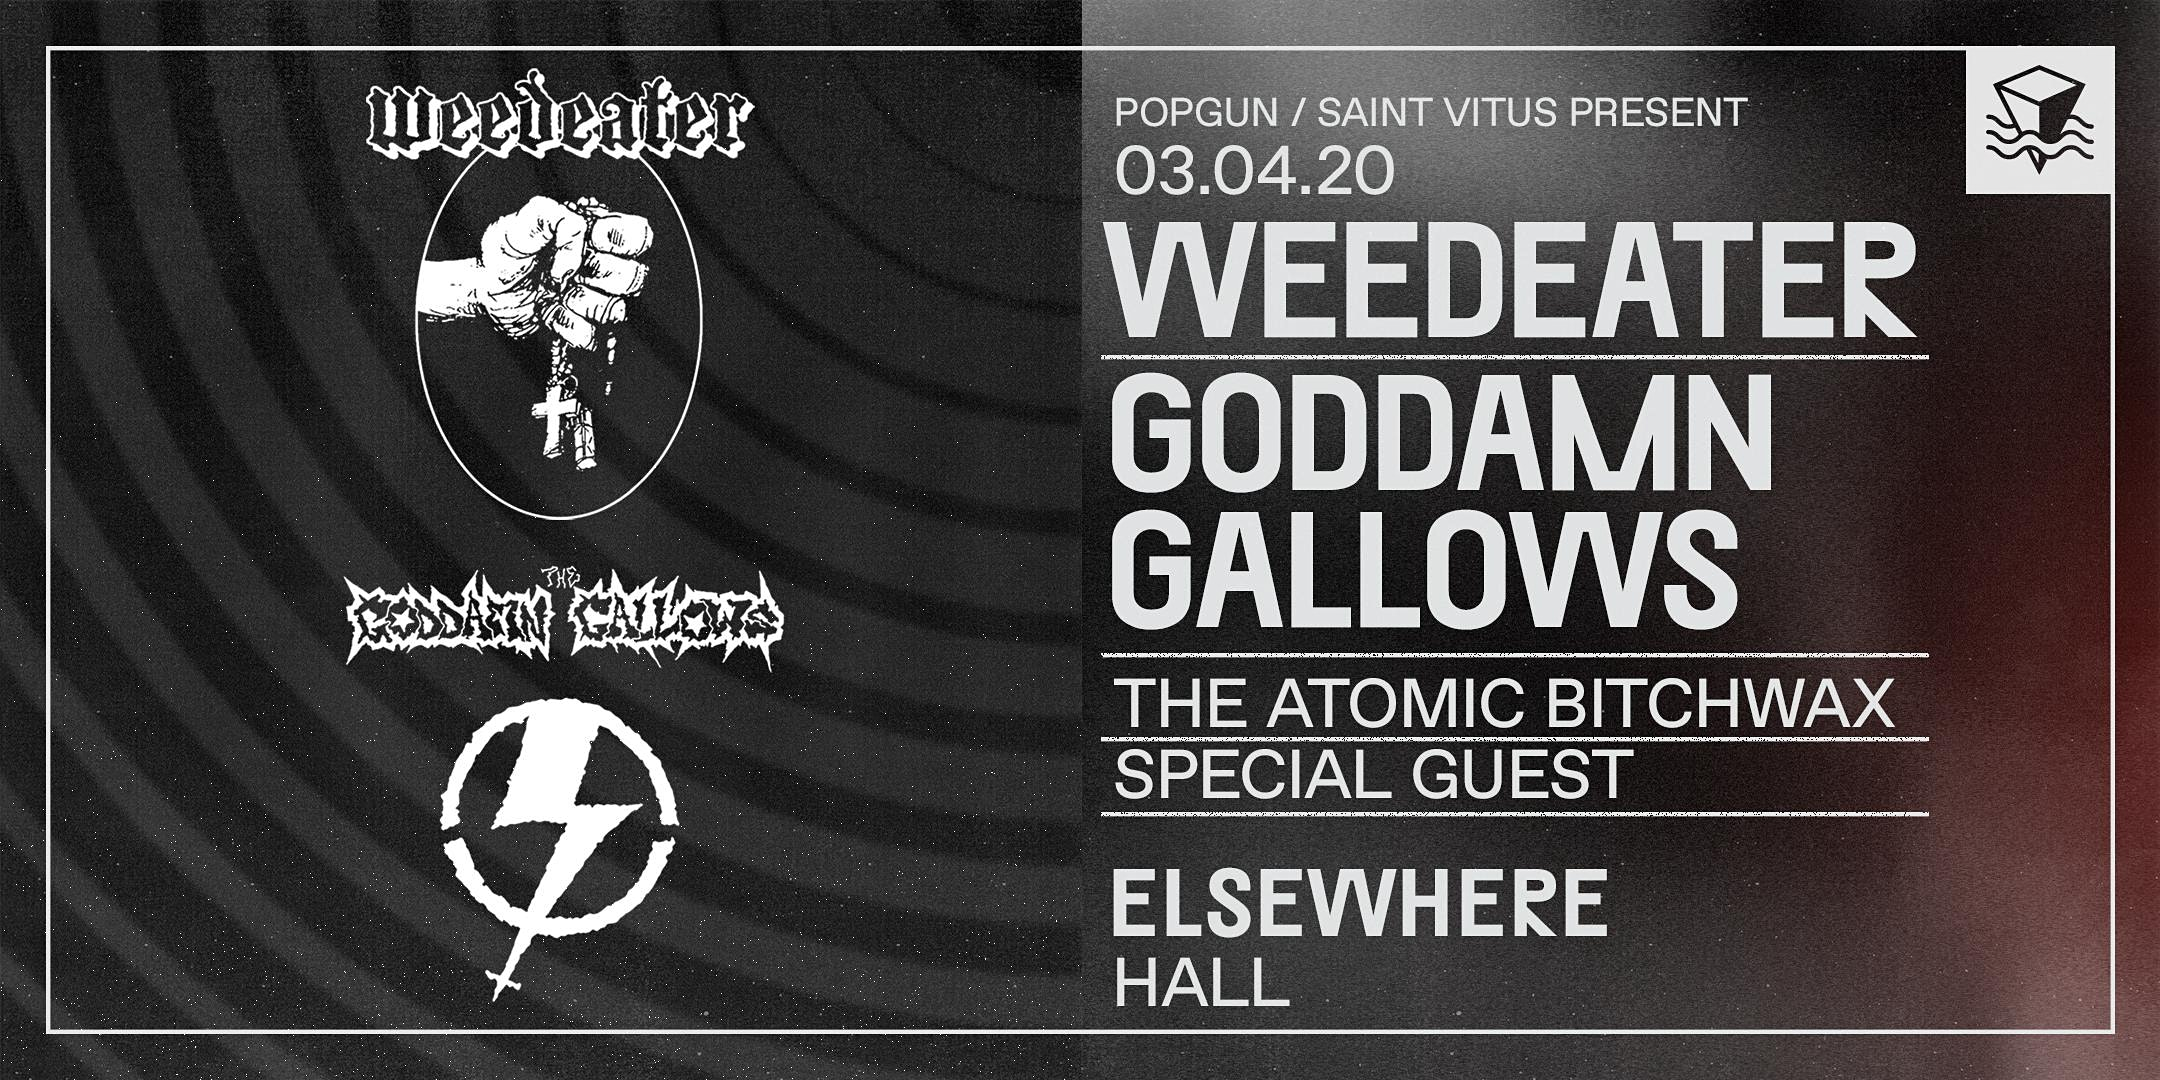 Weedeater + Goddamn Gallows